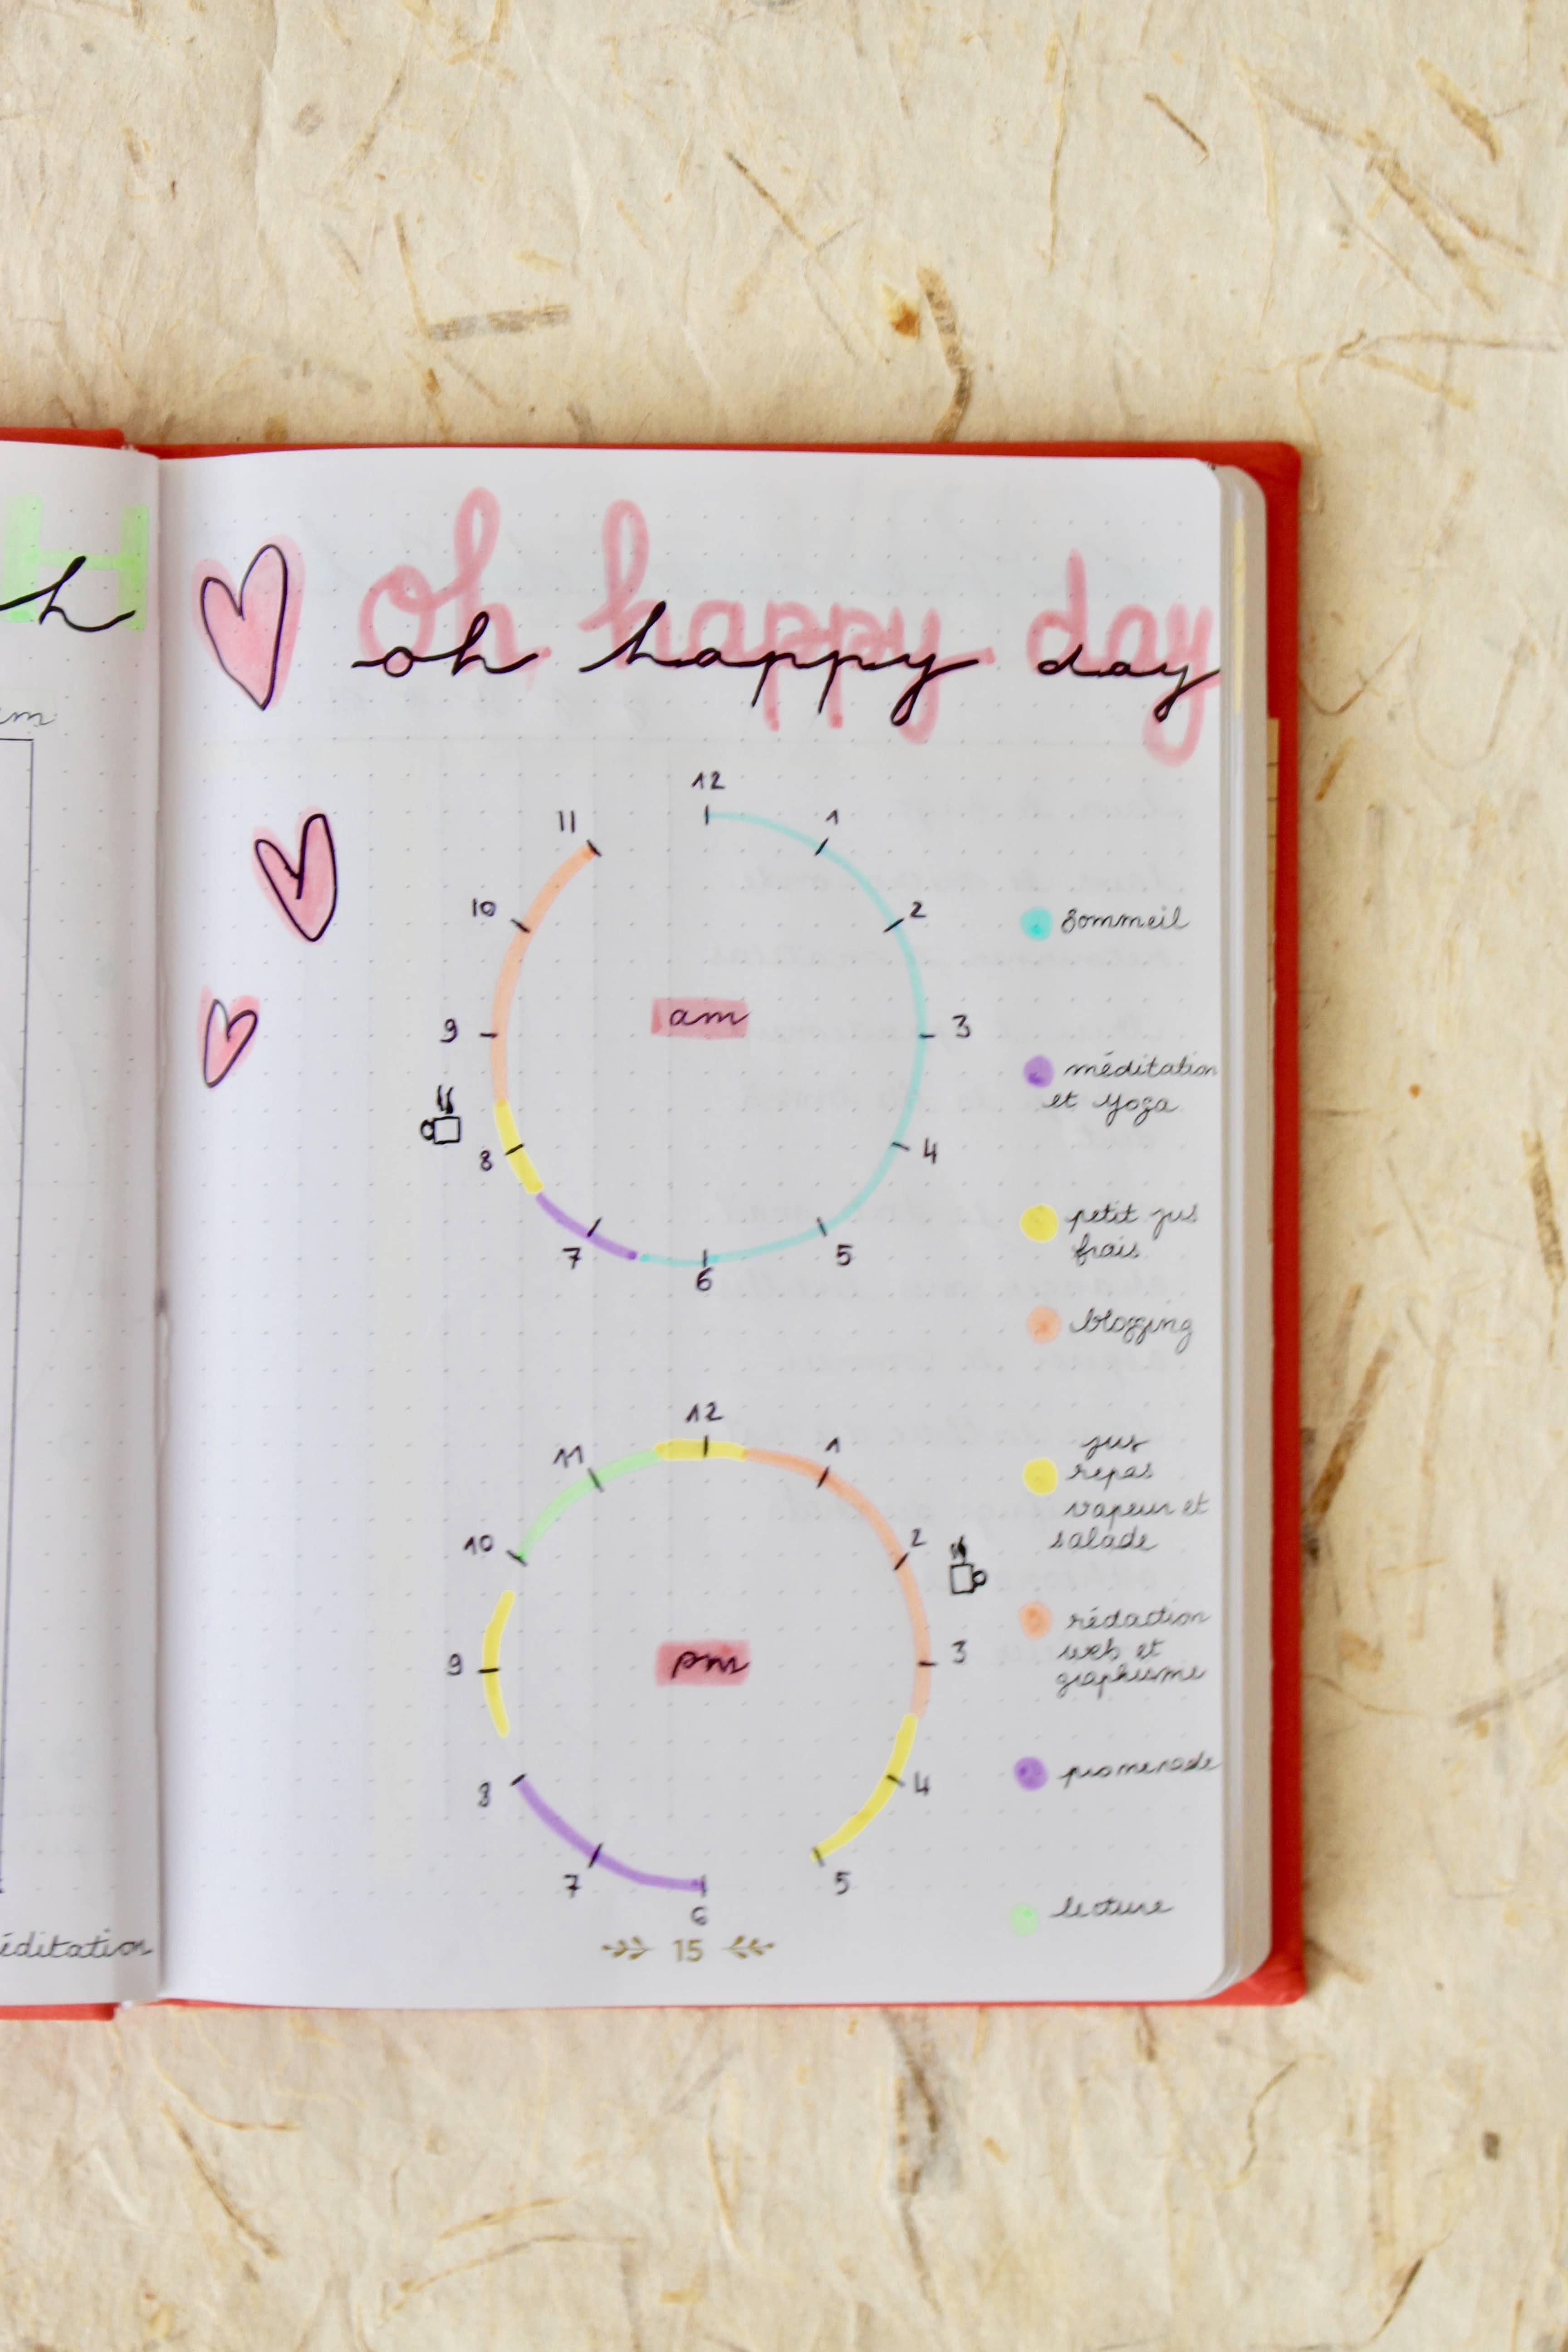 bullet-journal-exemple-journee-ideale-happy-day